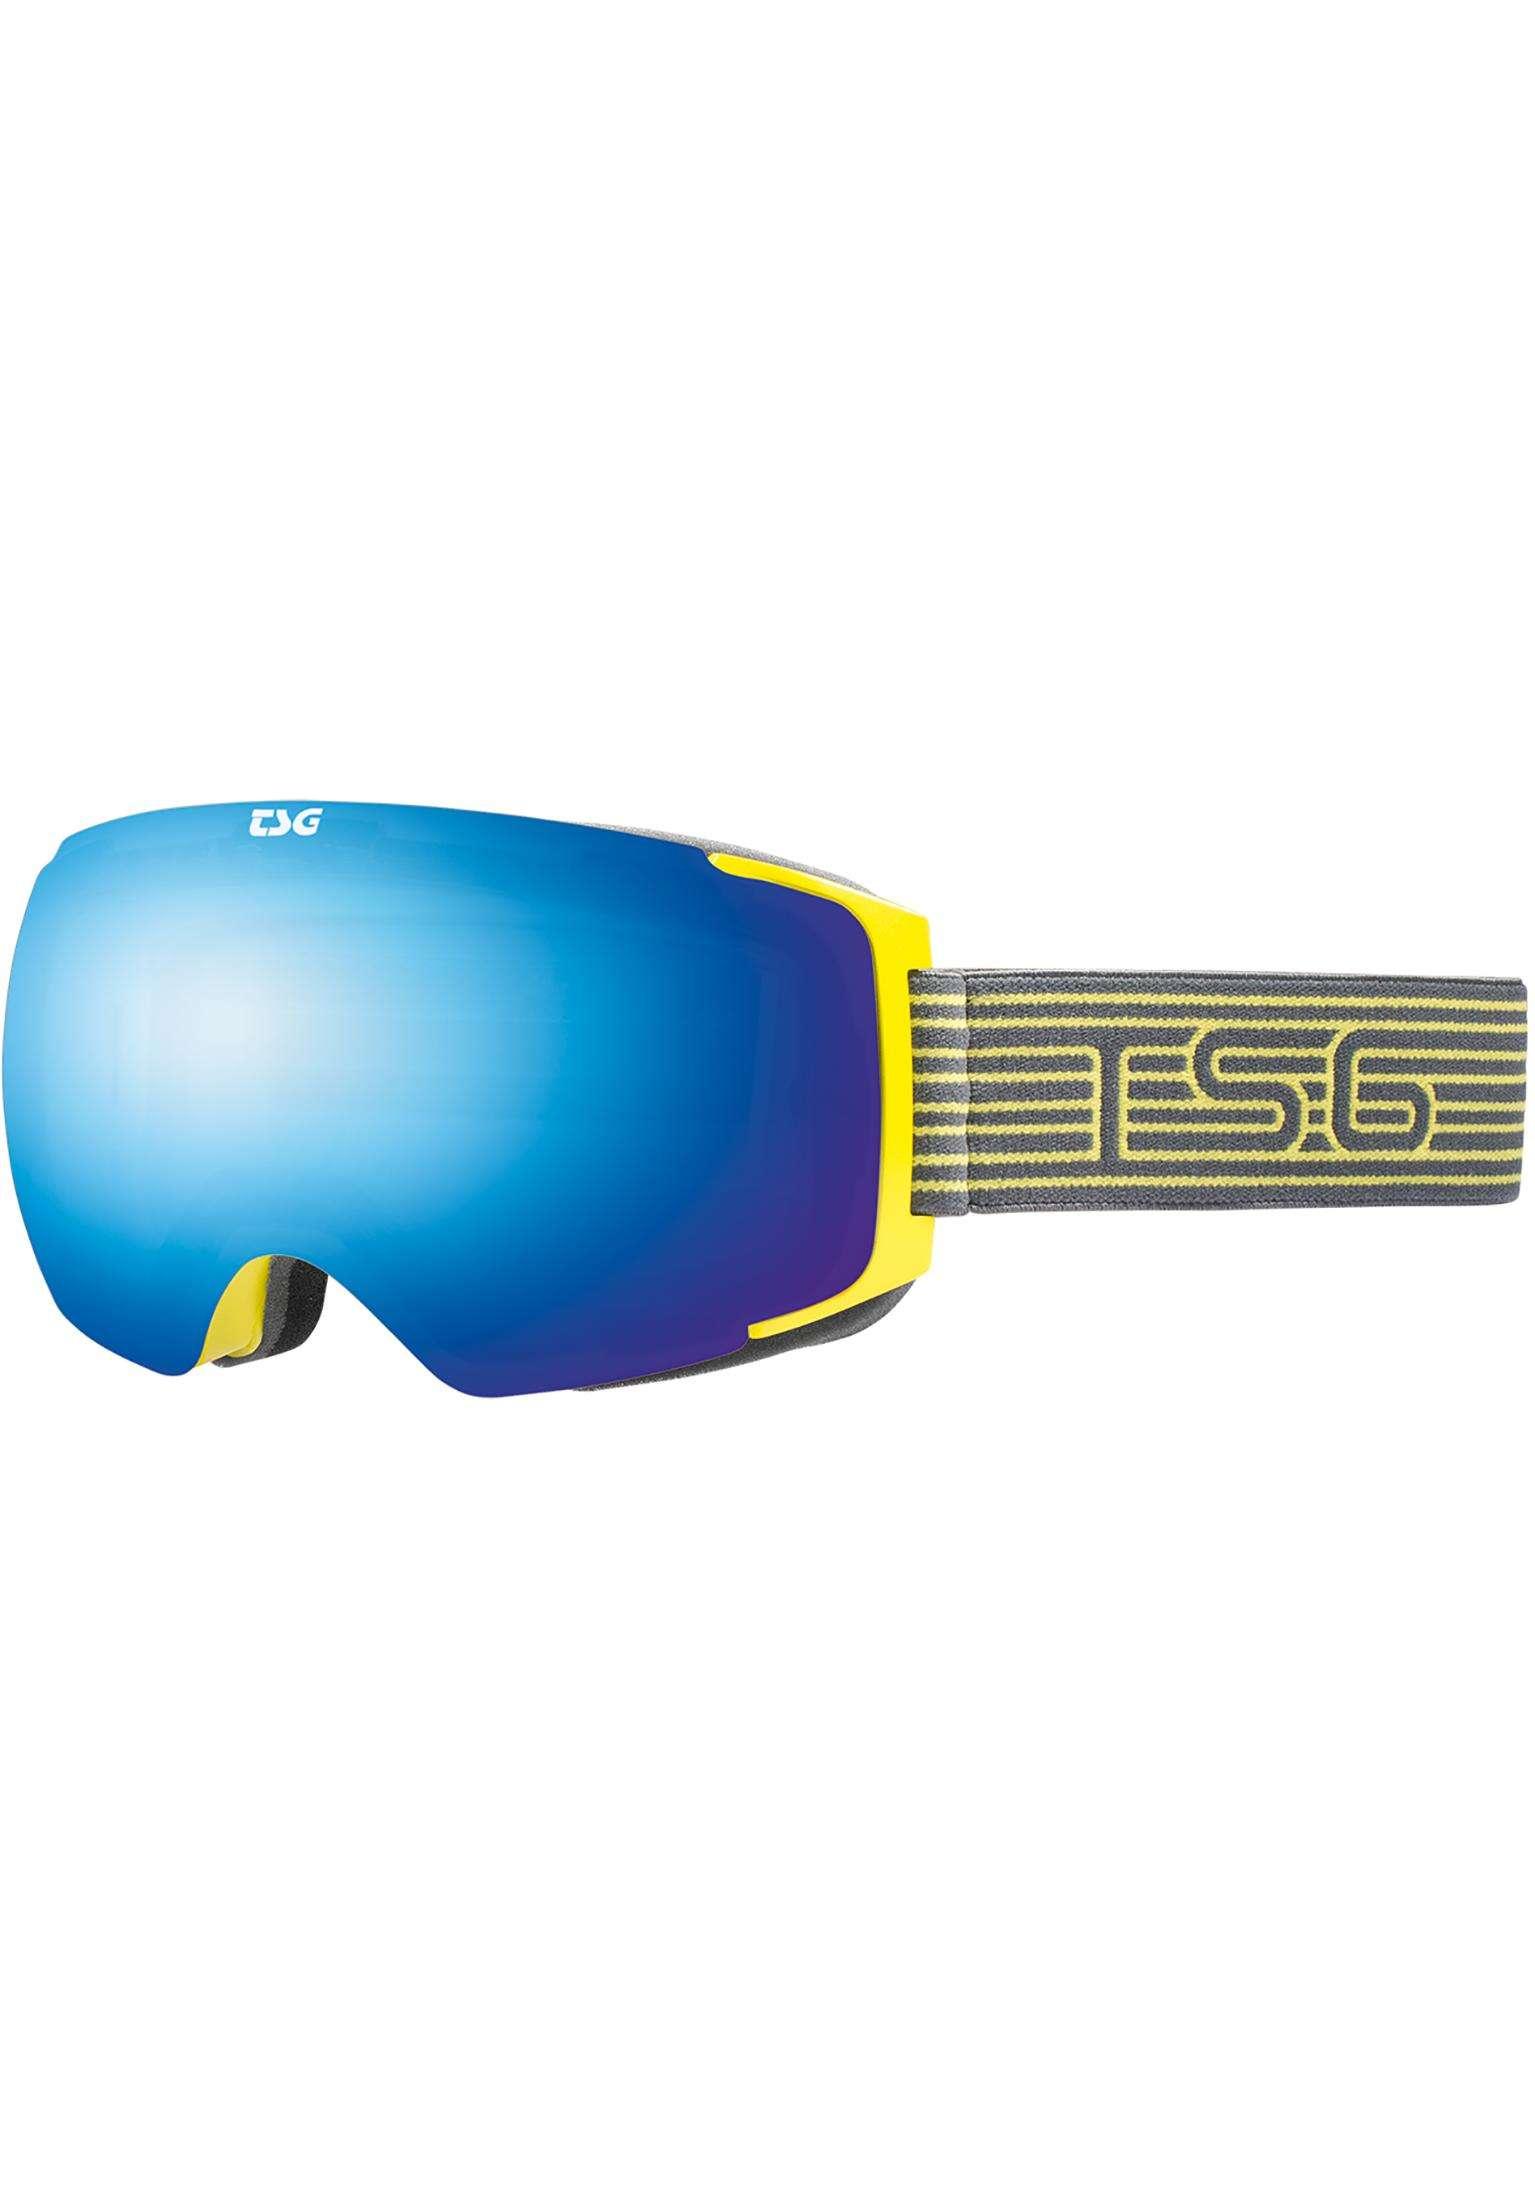 85cd47958b3f Goggle Two TSG Snowboard Goggles in pole-blue chrome